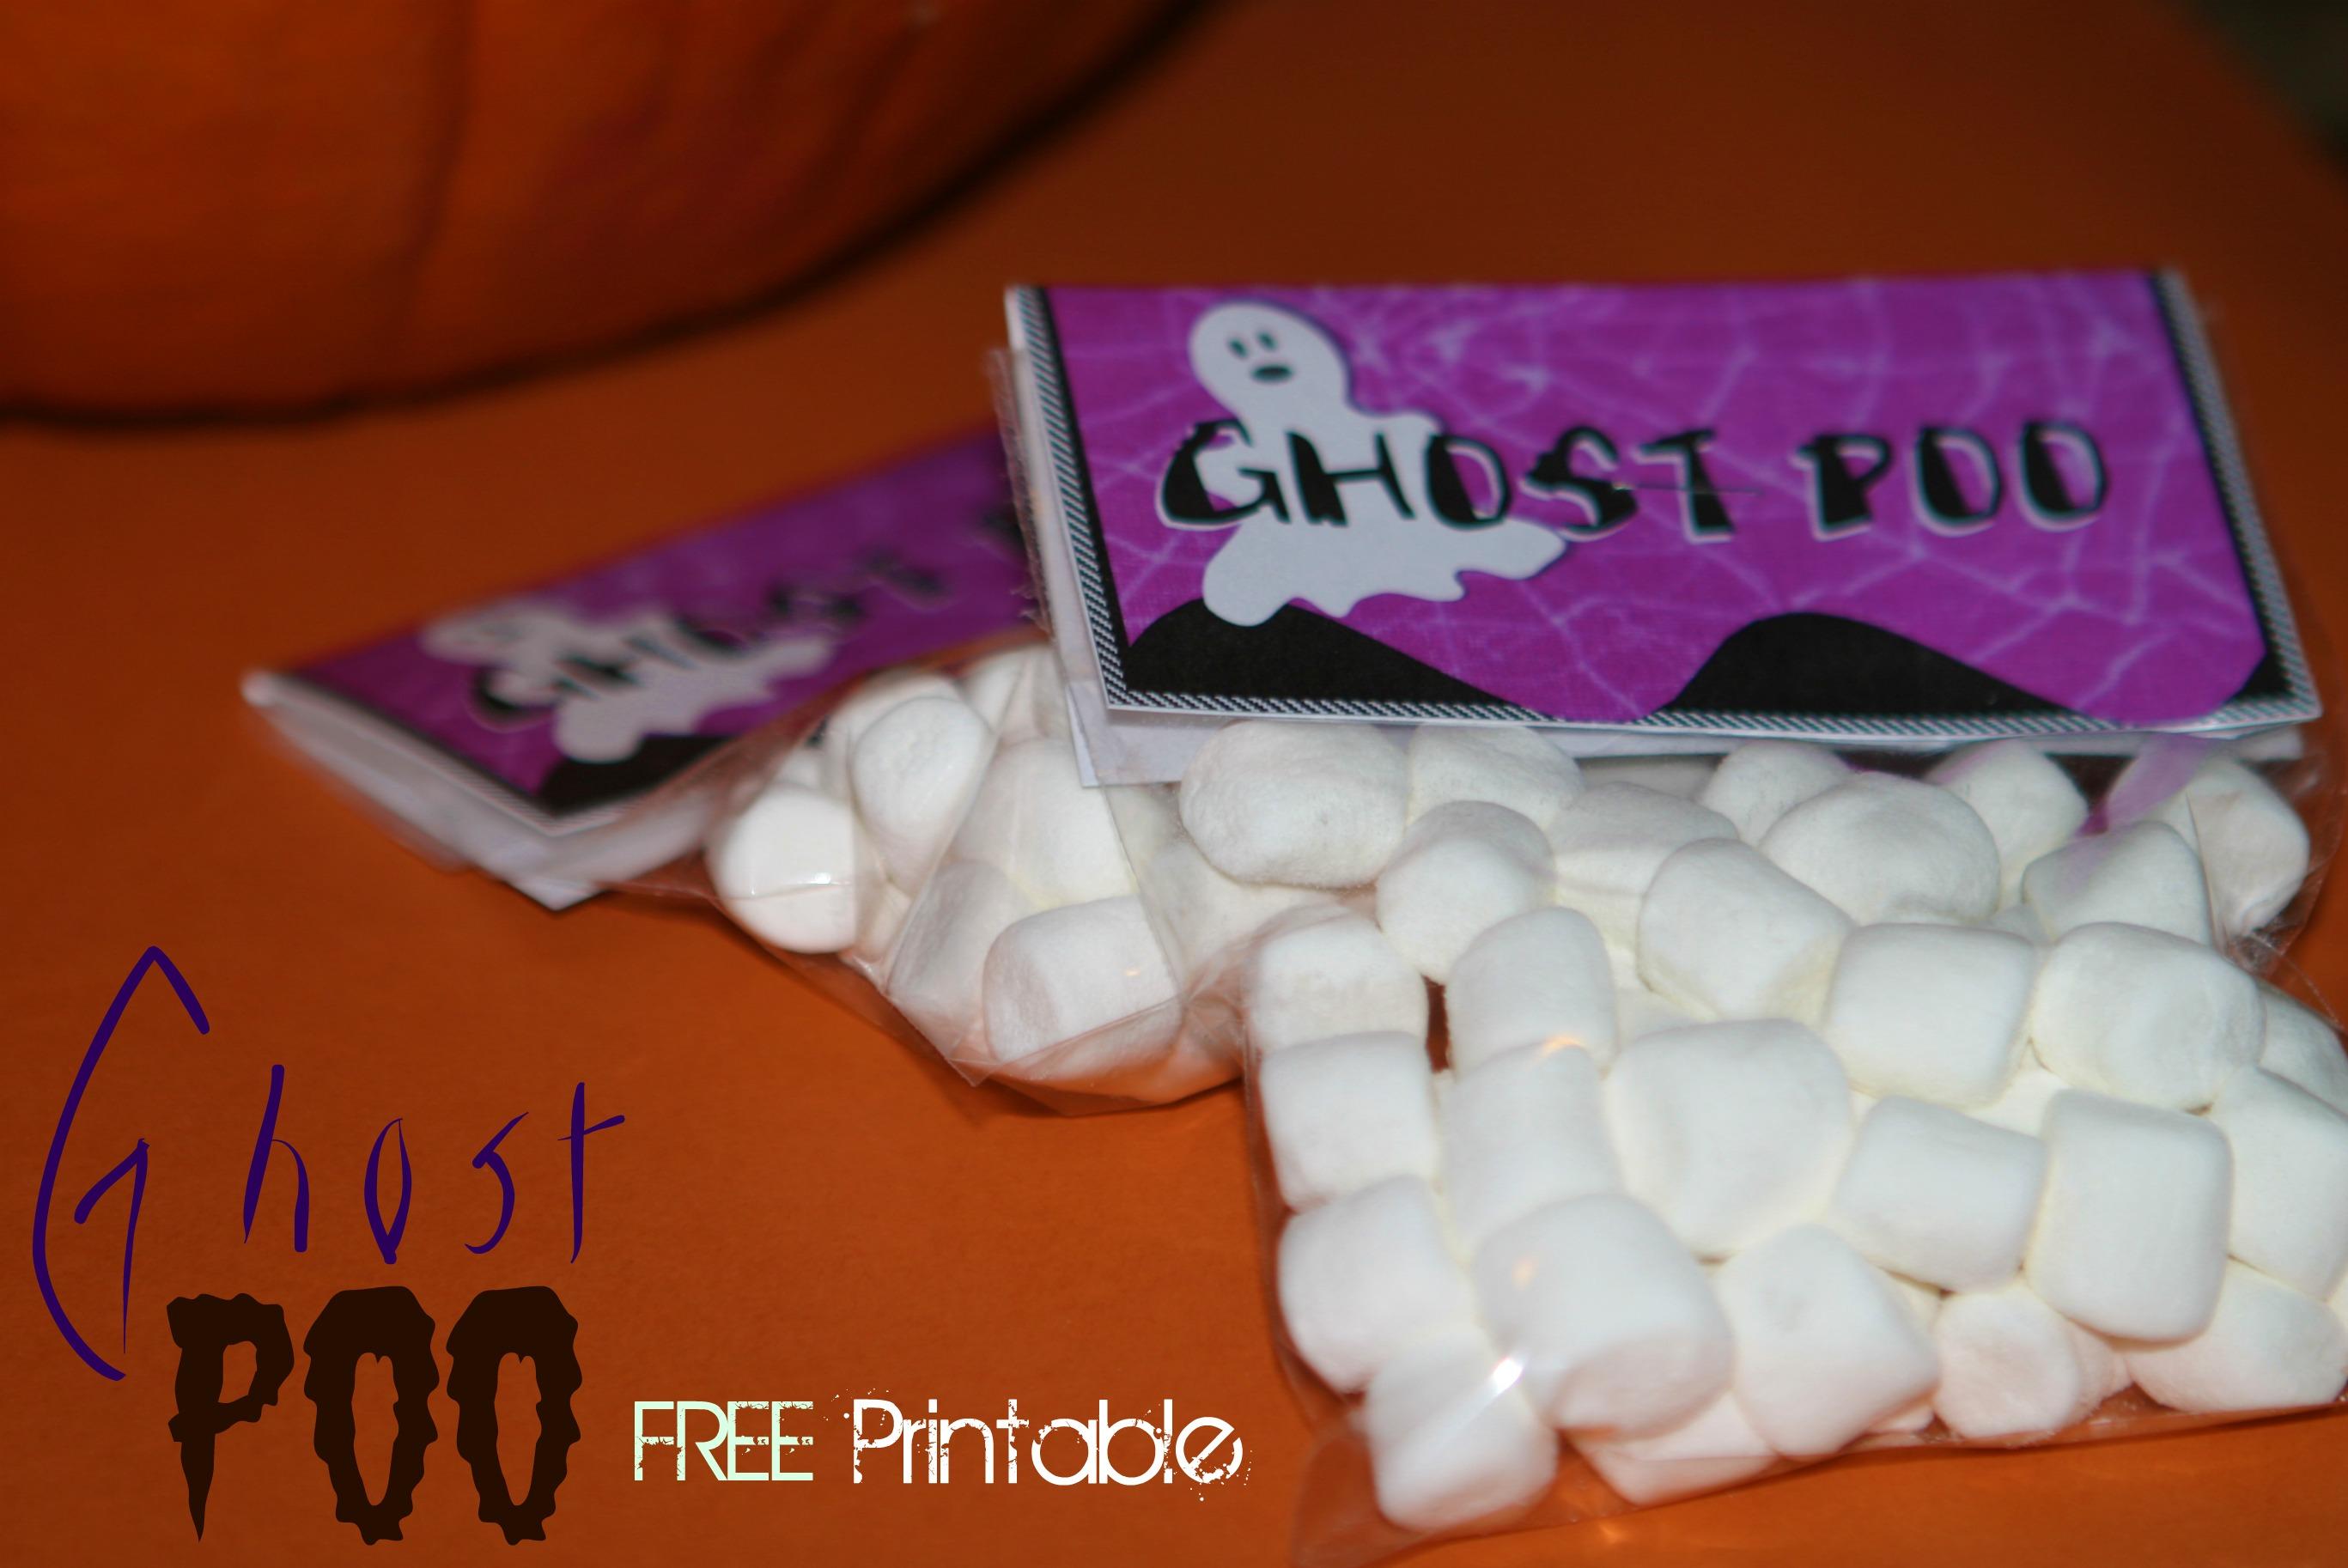 halloween craft idea: ghost poo with free printable | crystalandcomp